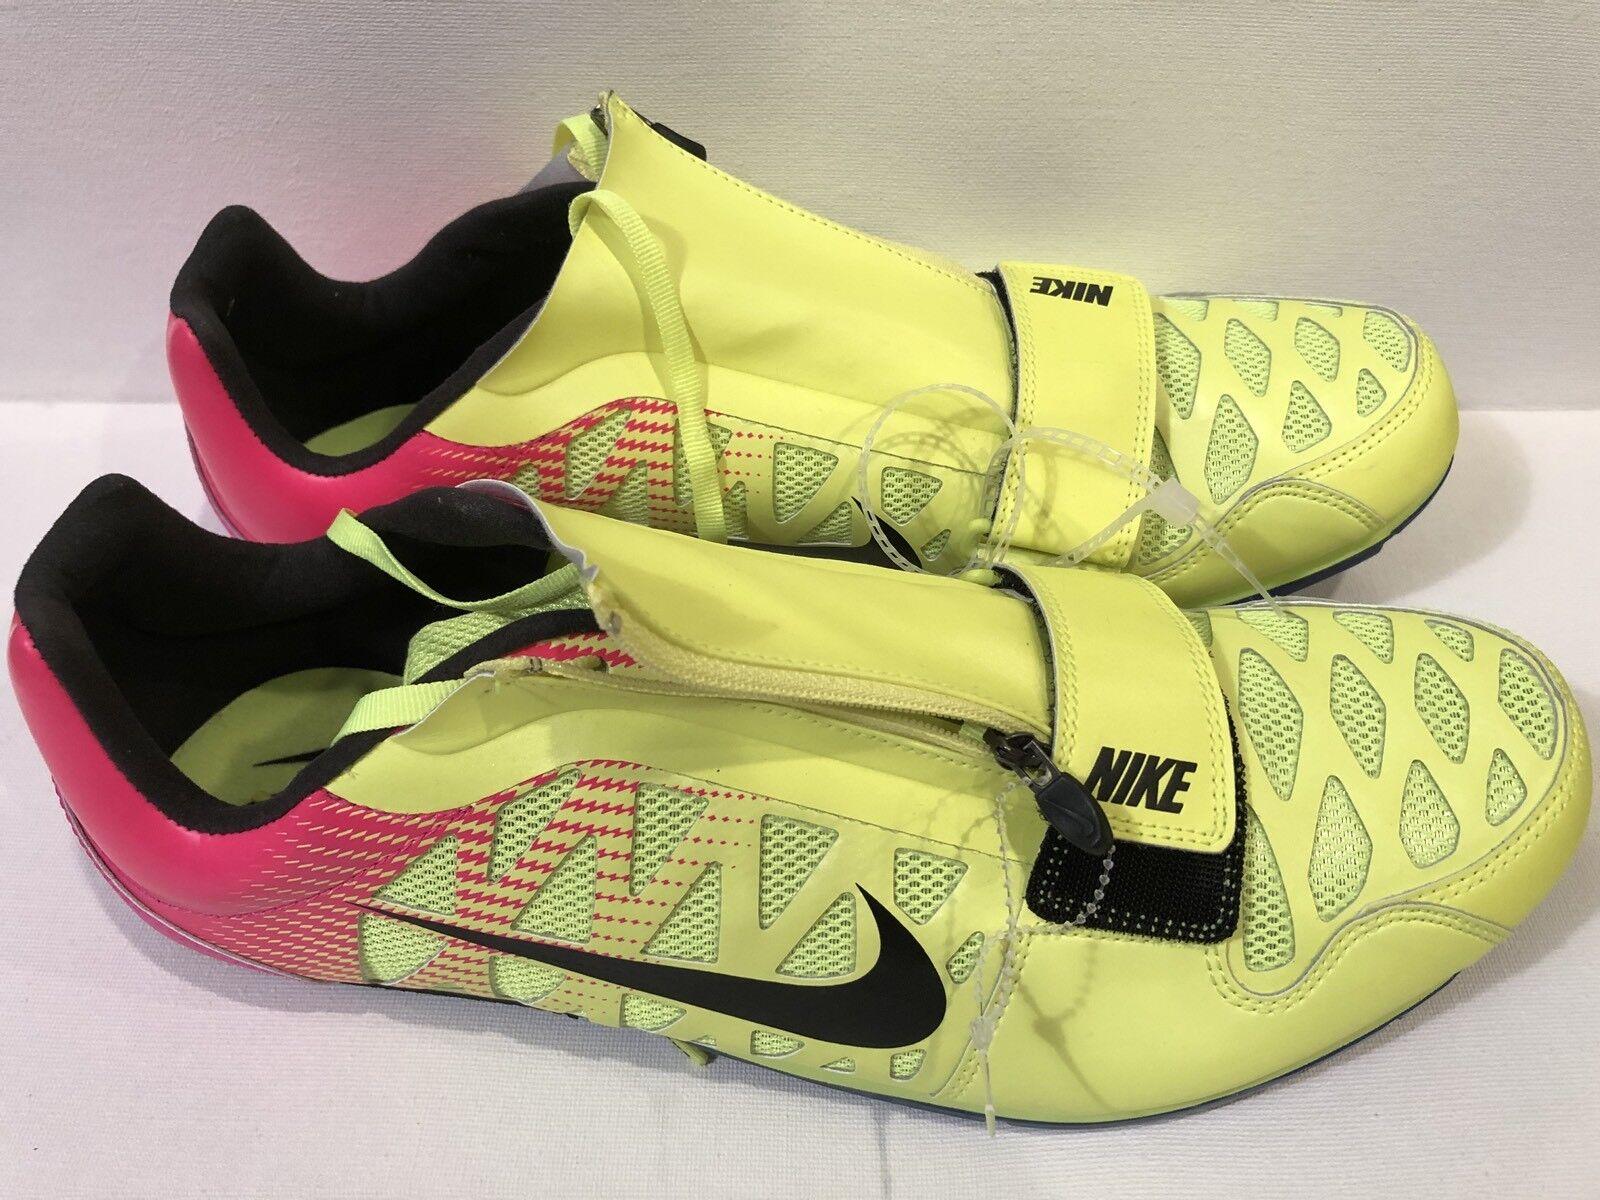 Nike Zoom LJ 4 Long Jump Track Track Track shoes Spikes Sz 12 Volt Pink Black 415339-999 4865ca